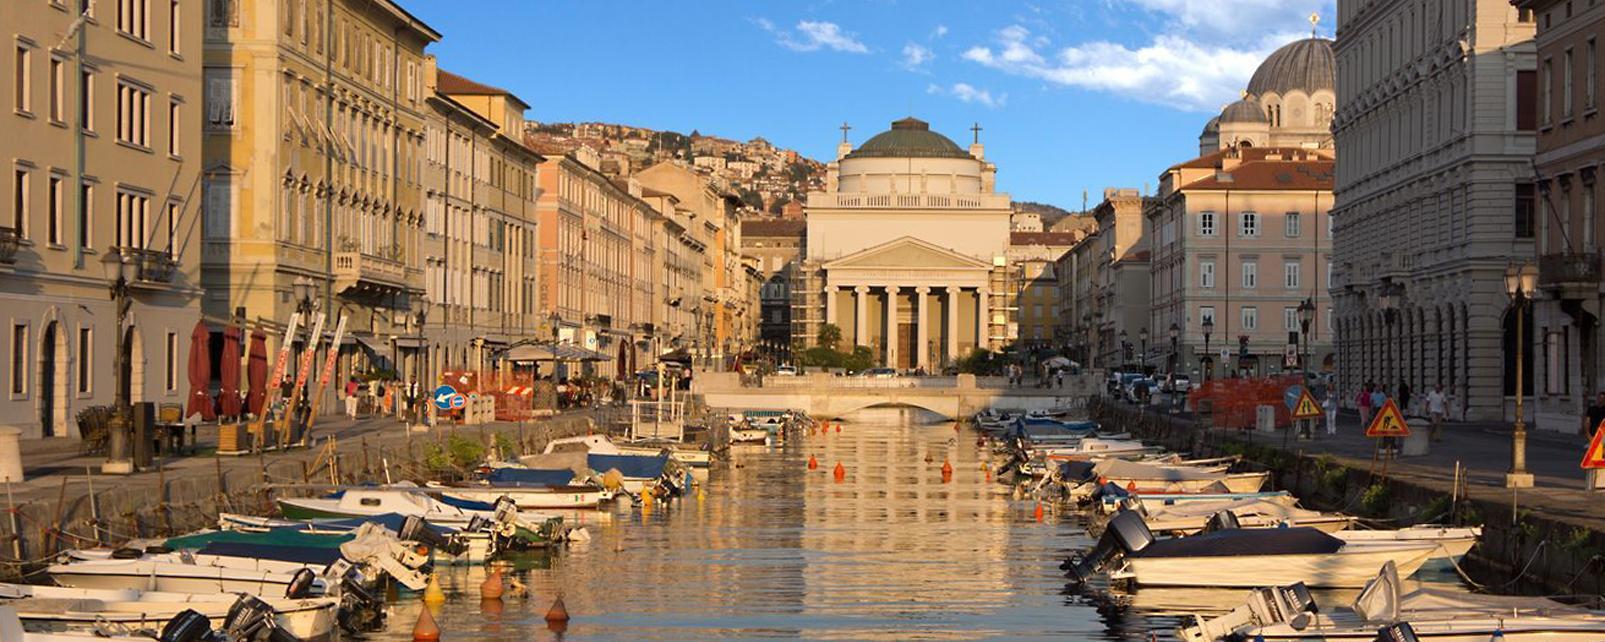 Trieste Italy  city photo : Travel to Trieste, Italy Trieste Travel Guide Easyvoyage